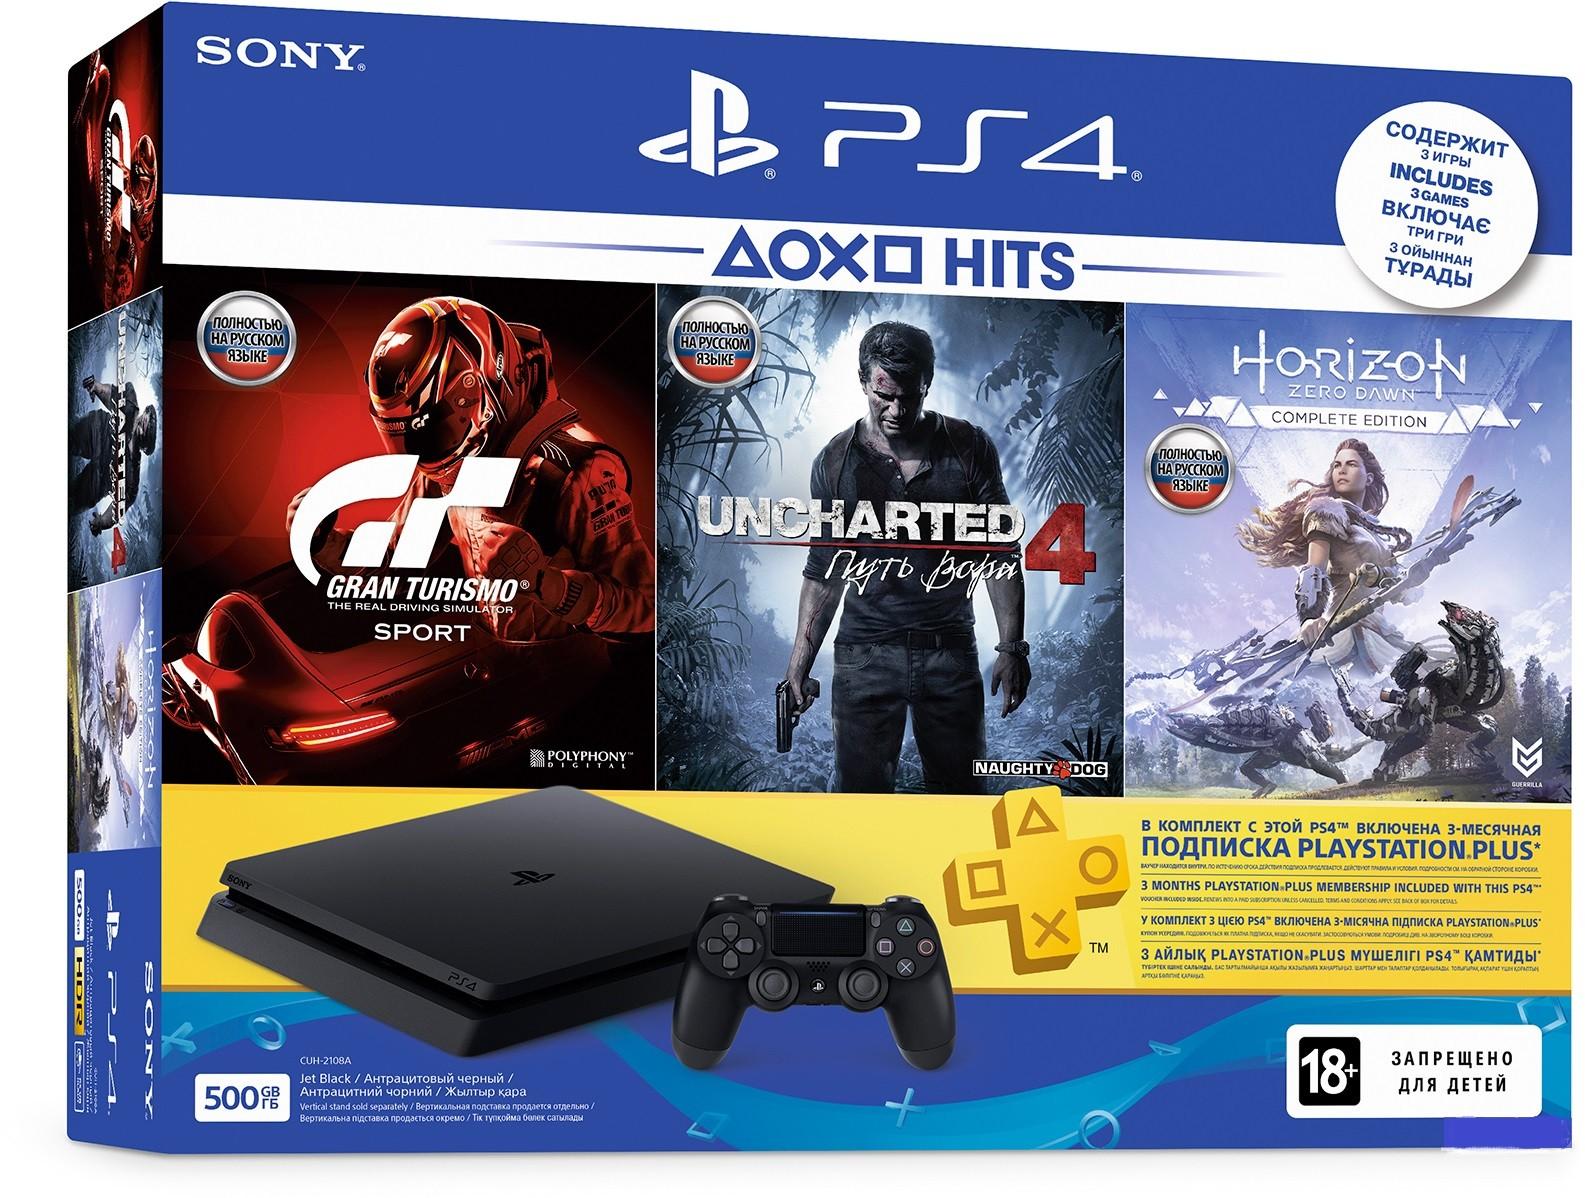 Sony PlayStation 4 Slim 500 GB Black Bundle + Gran Turismo Sport + Uncharted 4 + Horizon Zero Dawn. Complete Edition + PSPlus 3 місяці